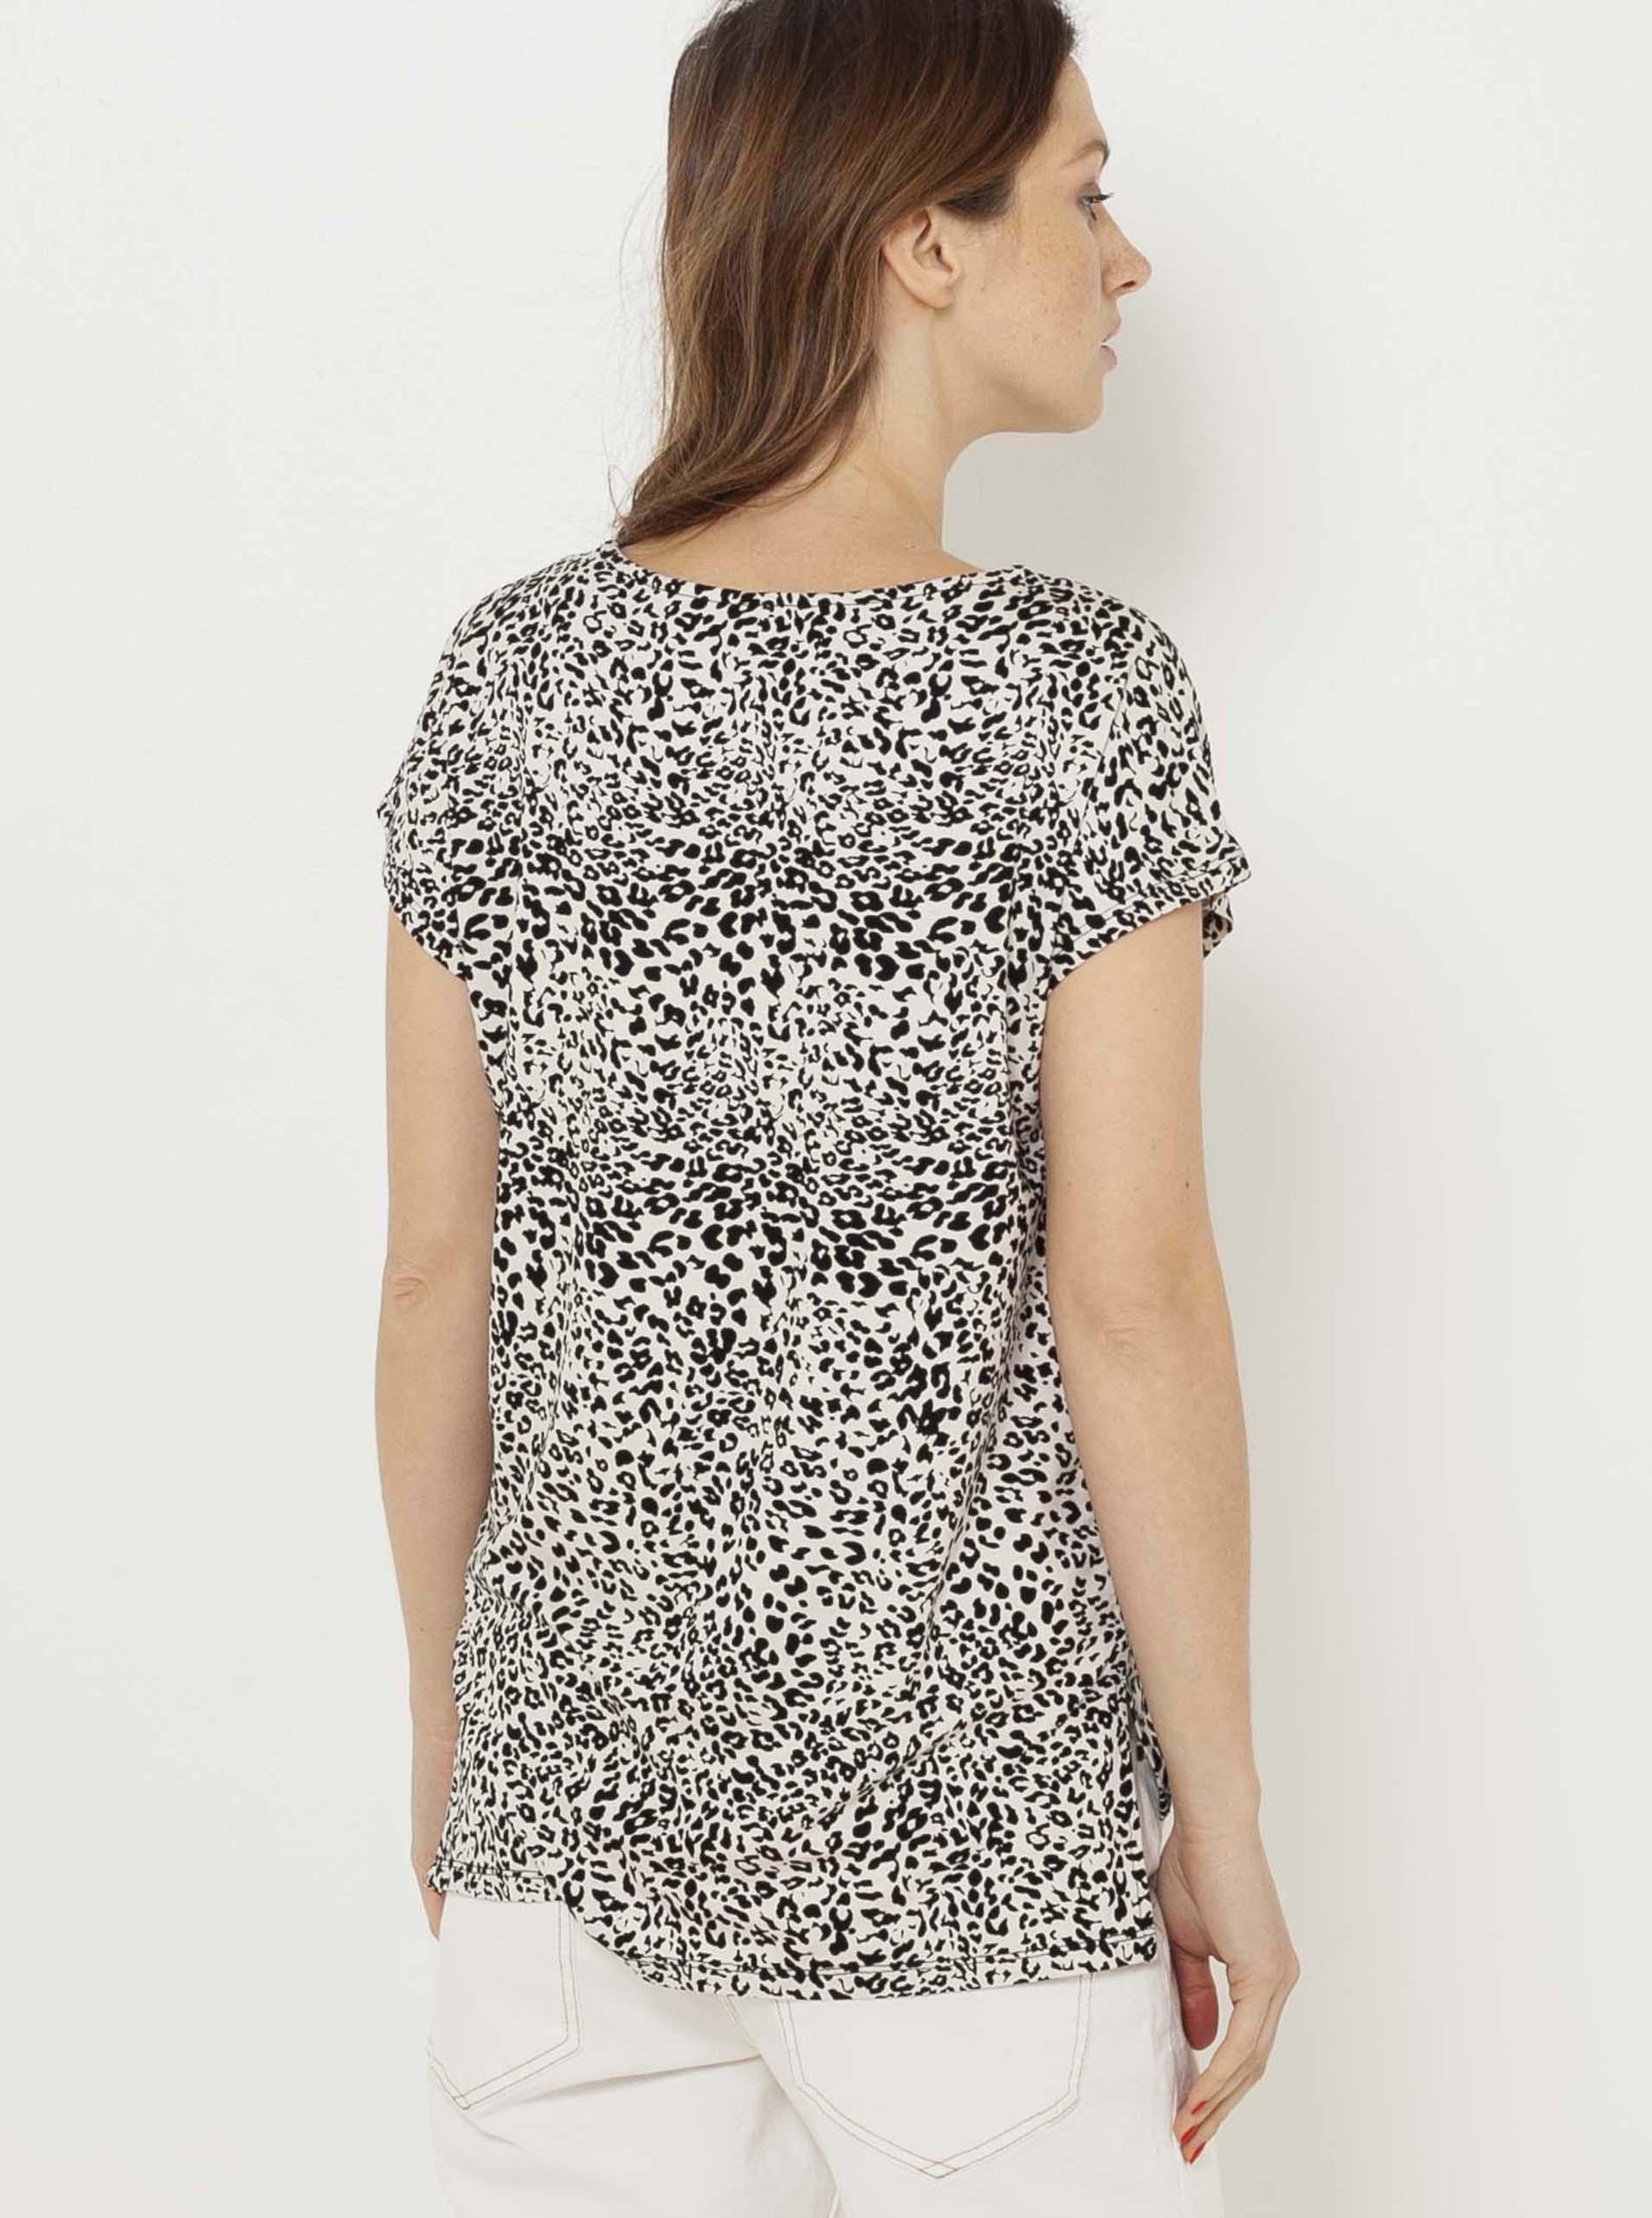 CAMAIEU beige blouse with pattern